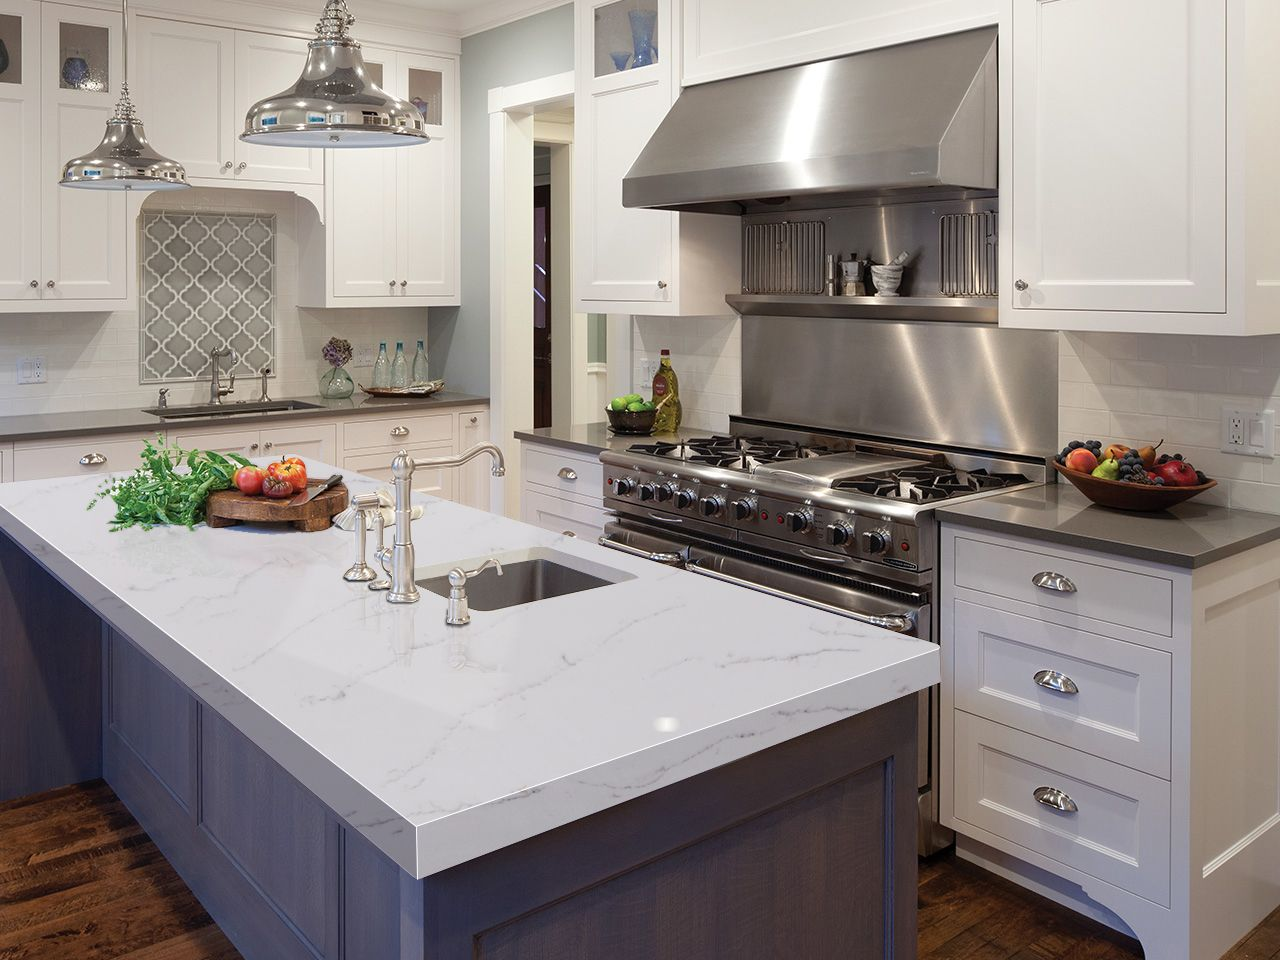 Calacatta Giotto Uquartz Universal Granite Marble Outdoor Kitchen Countertops Kitchen Remodel Replacing Kitchen Countertops